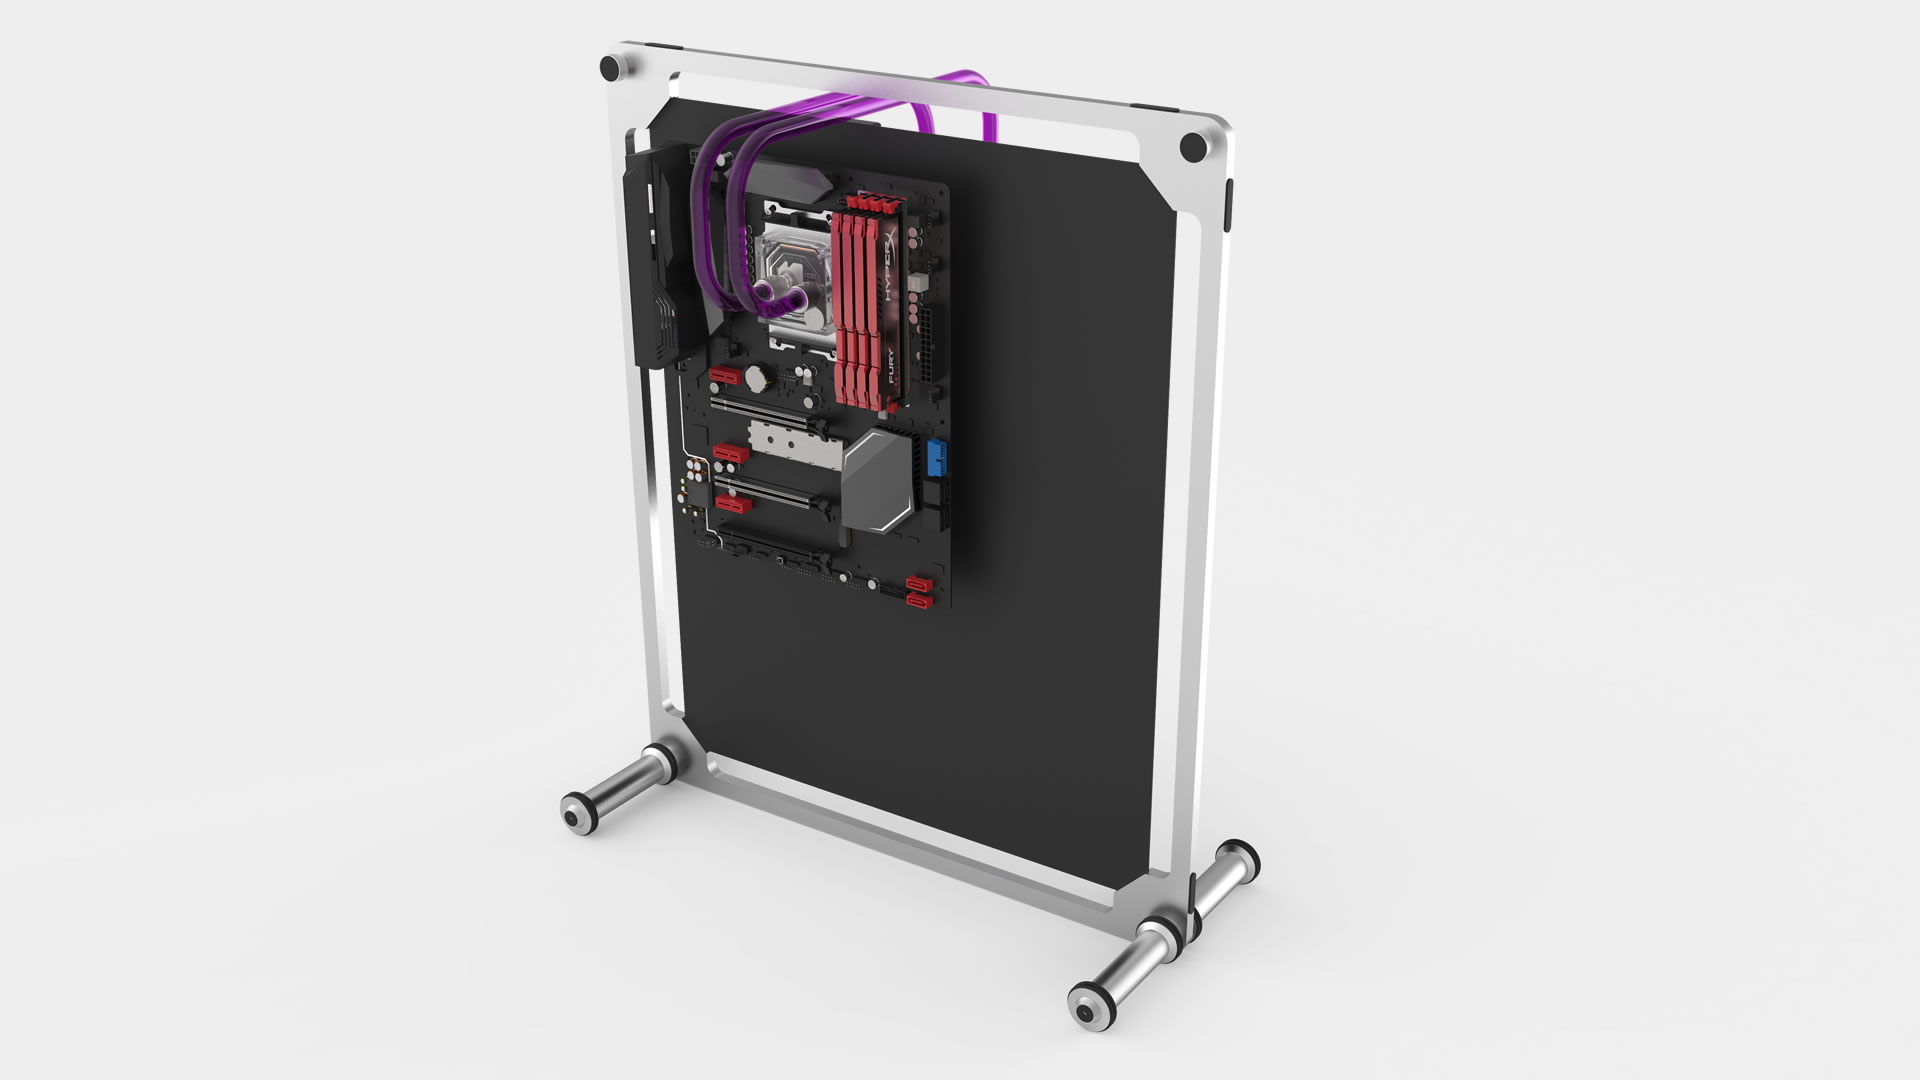 streacom canvas case neues pc geh use basiert auf starken. Black Bedroom Furniture Sets. Home Design Ideas